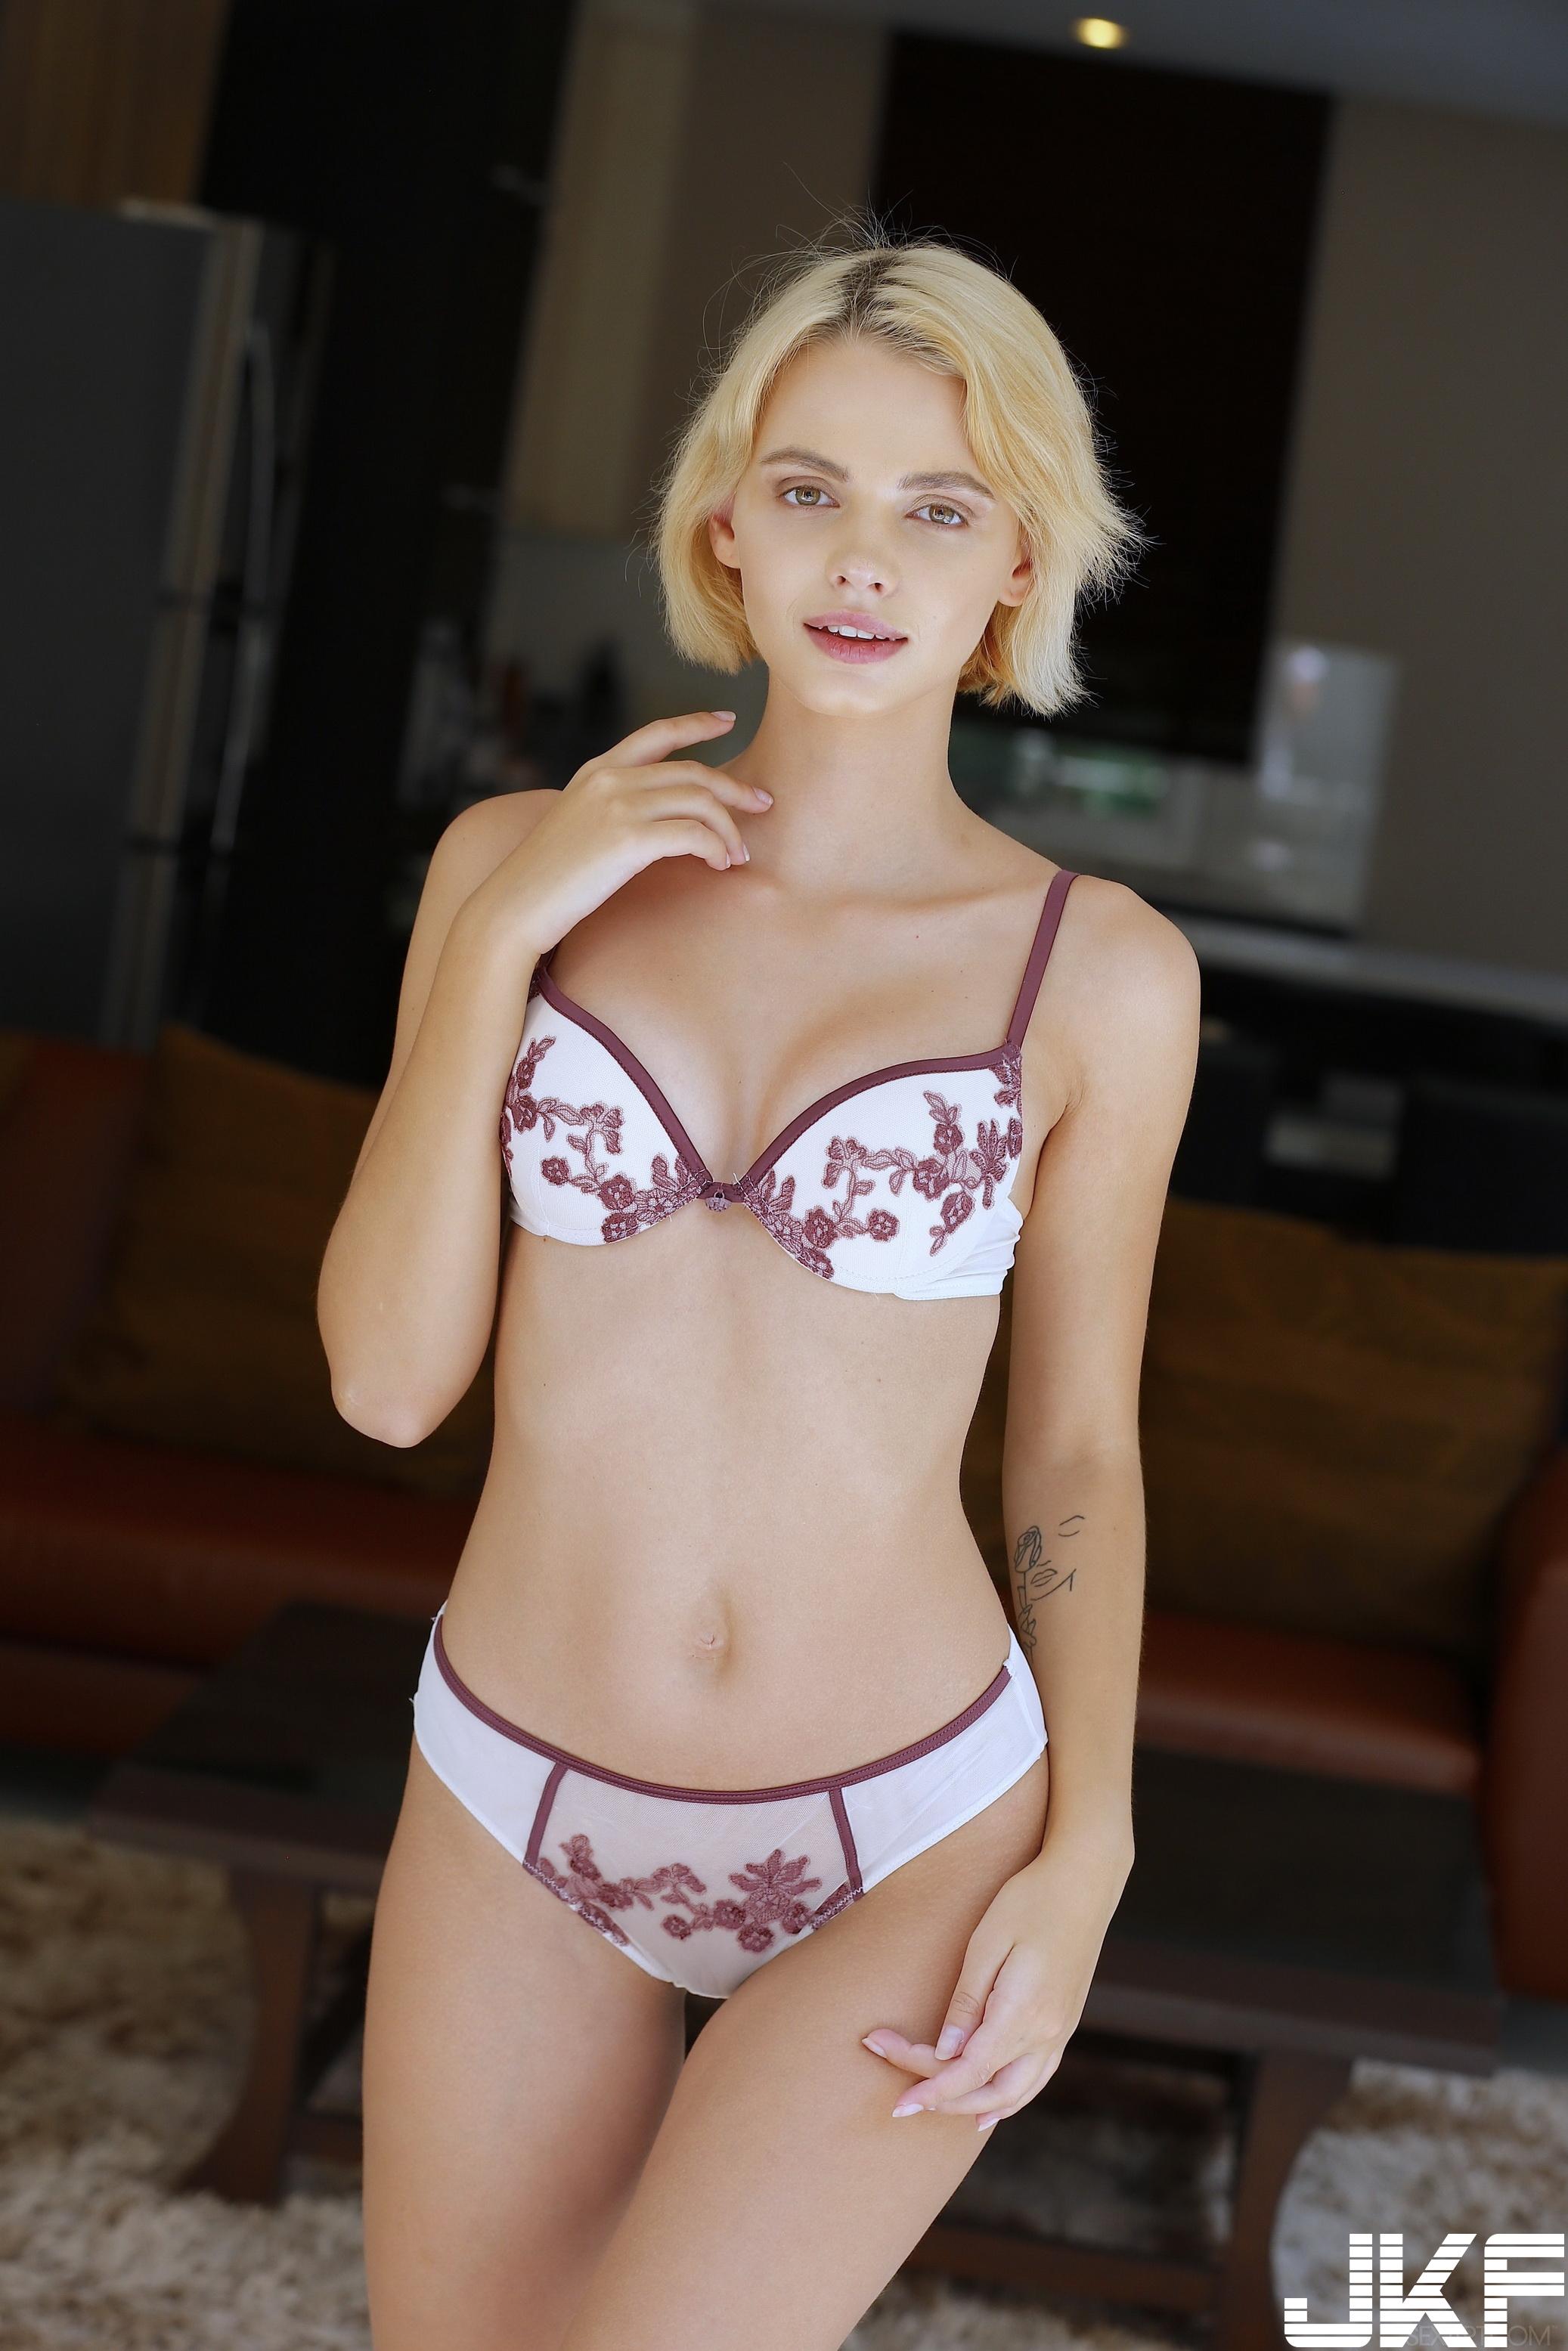 SexArt_Zemie_Lilit-A_high_0013.jpg